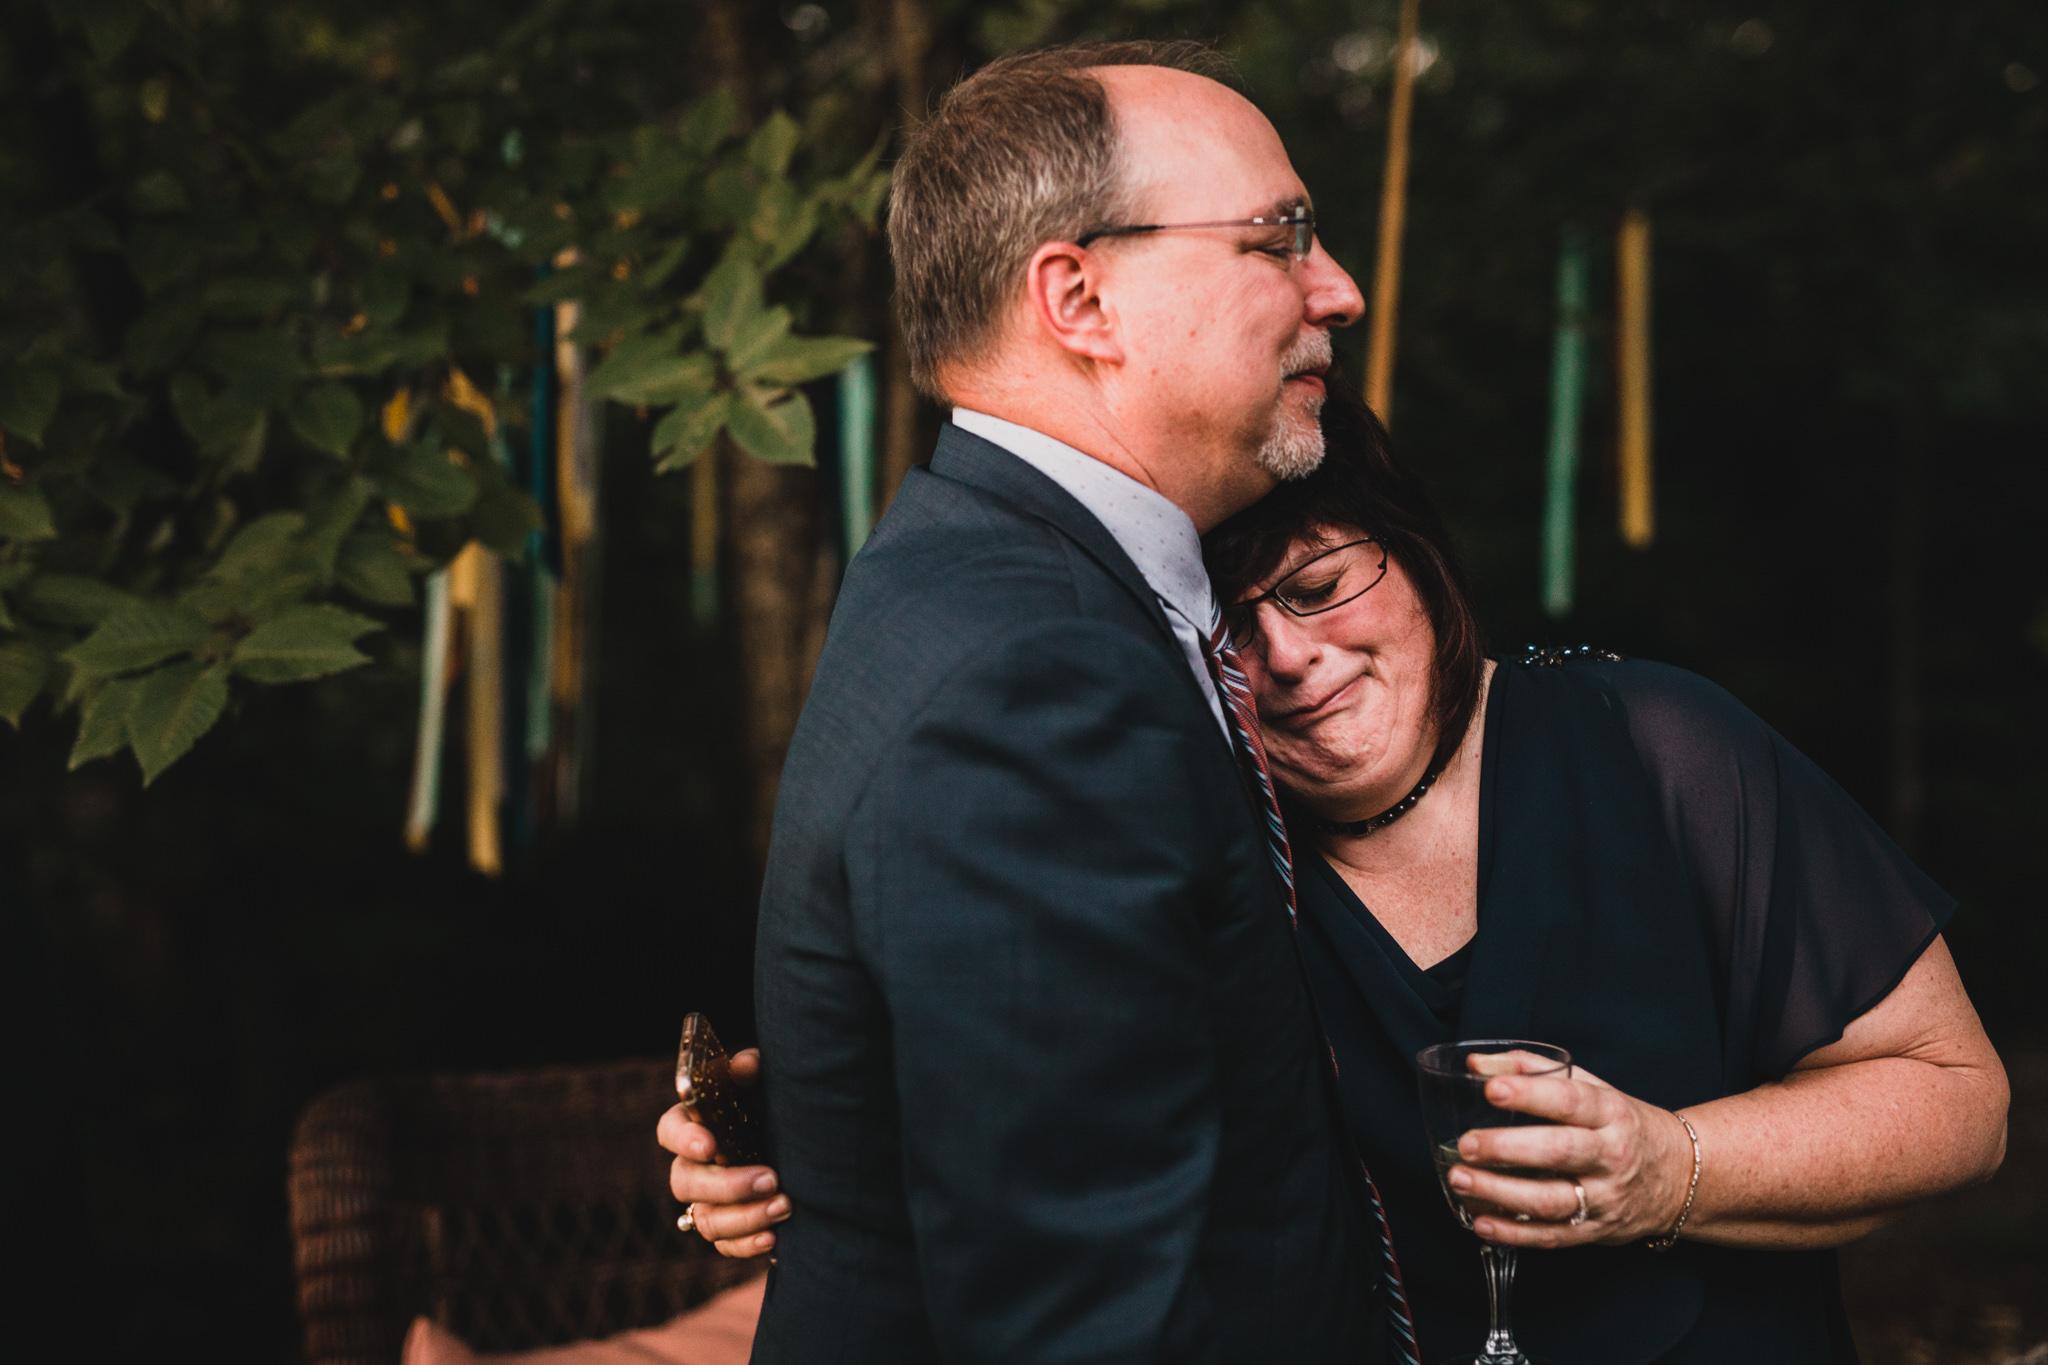 Intimate, candid wedding moments